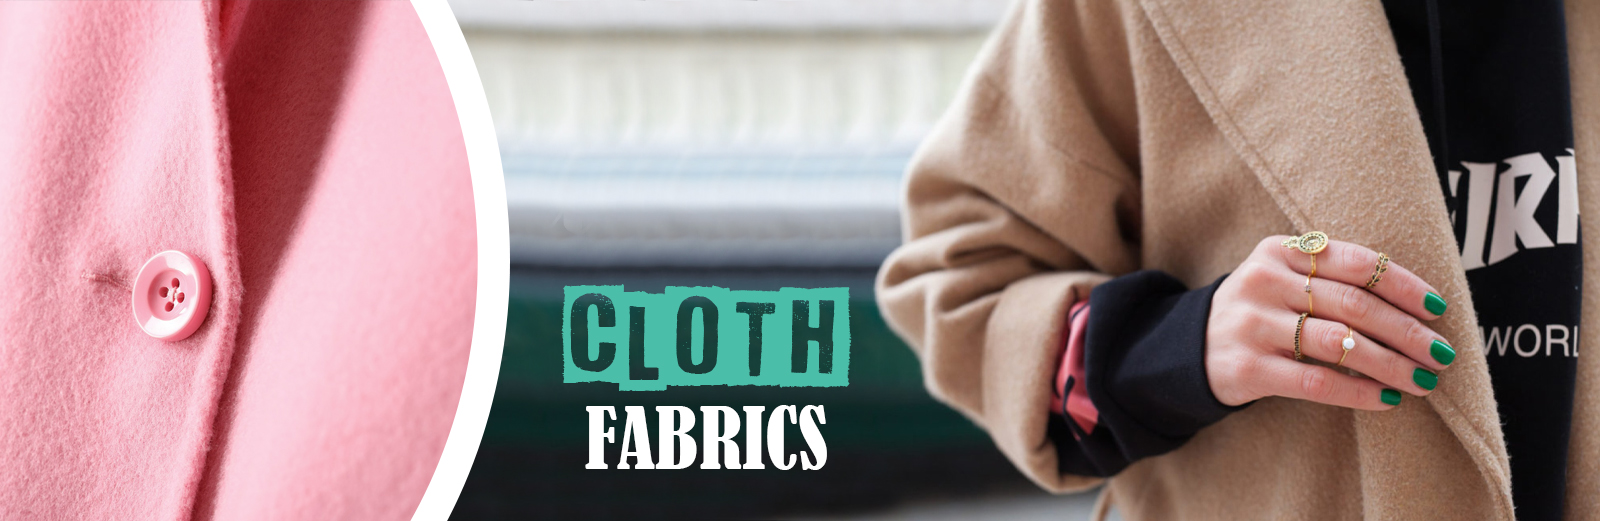 CLOTH FABRICS